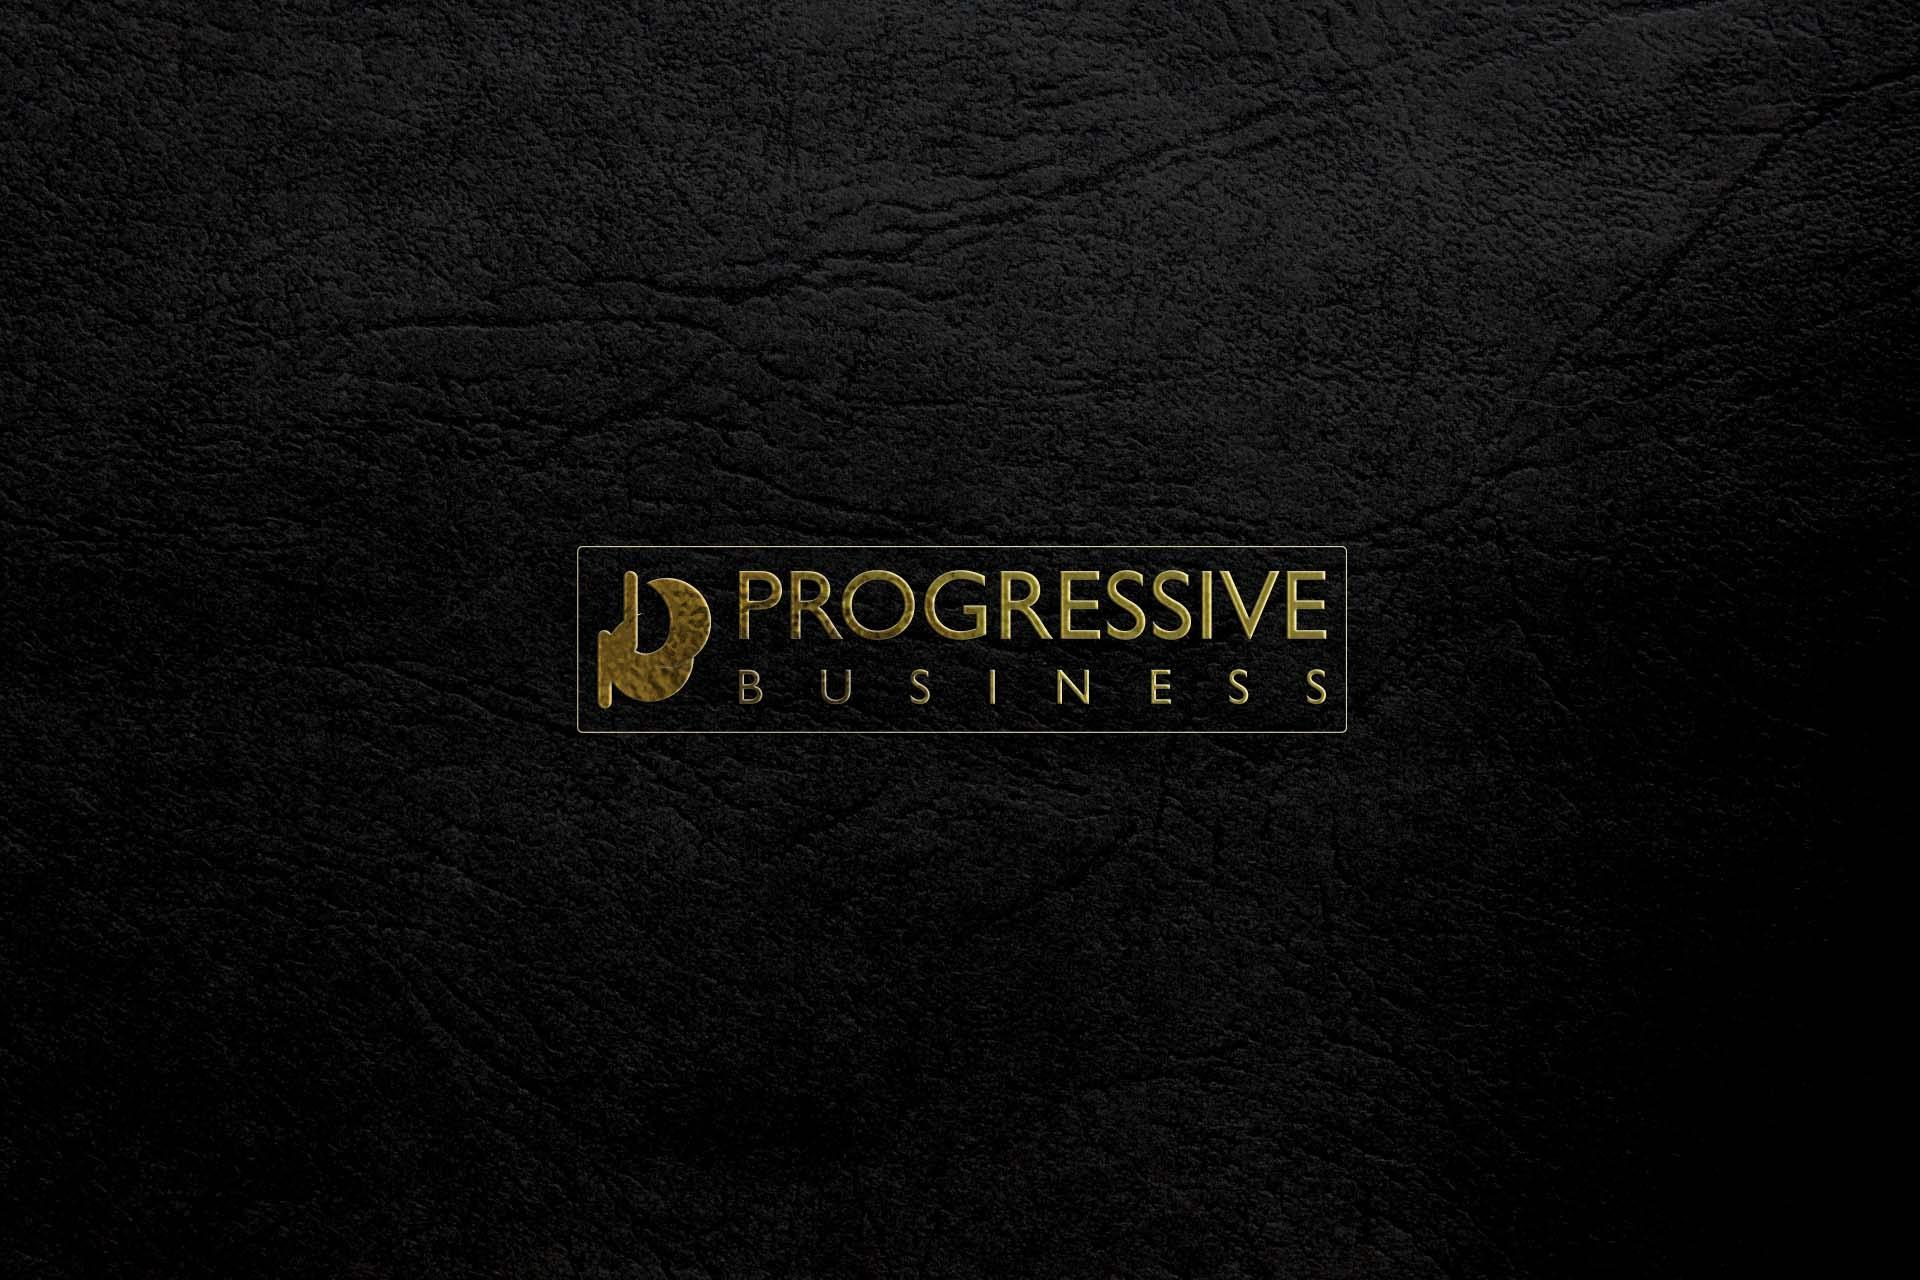 Logo Design by AKM Fazley Rabbi Faruque - Entry No. 135 in the Logo Design Contest Captivating Logo Design for Progressive Business.